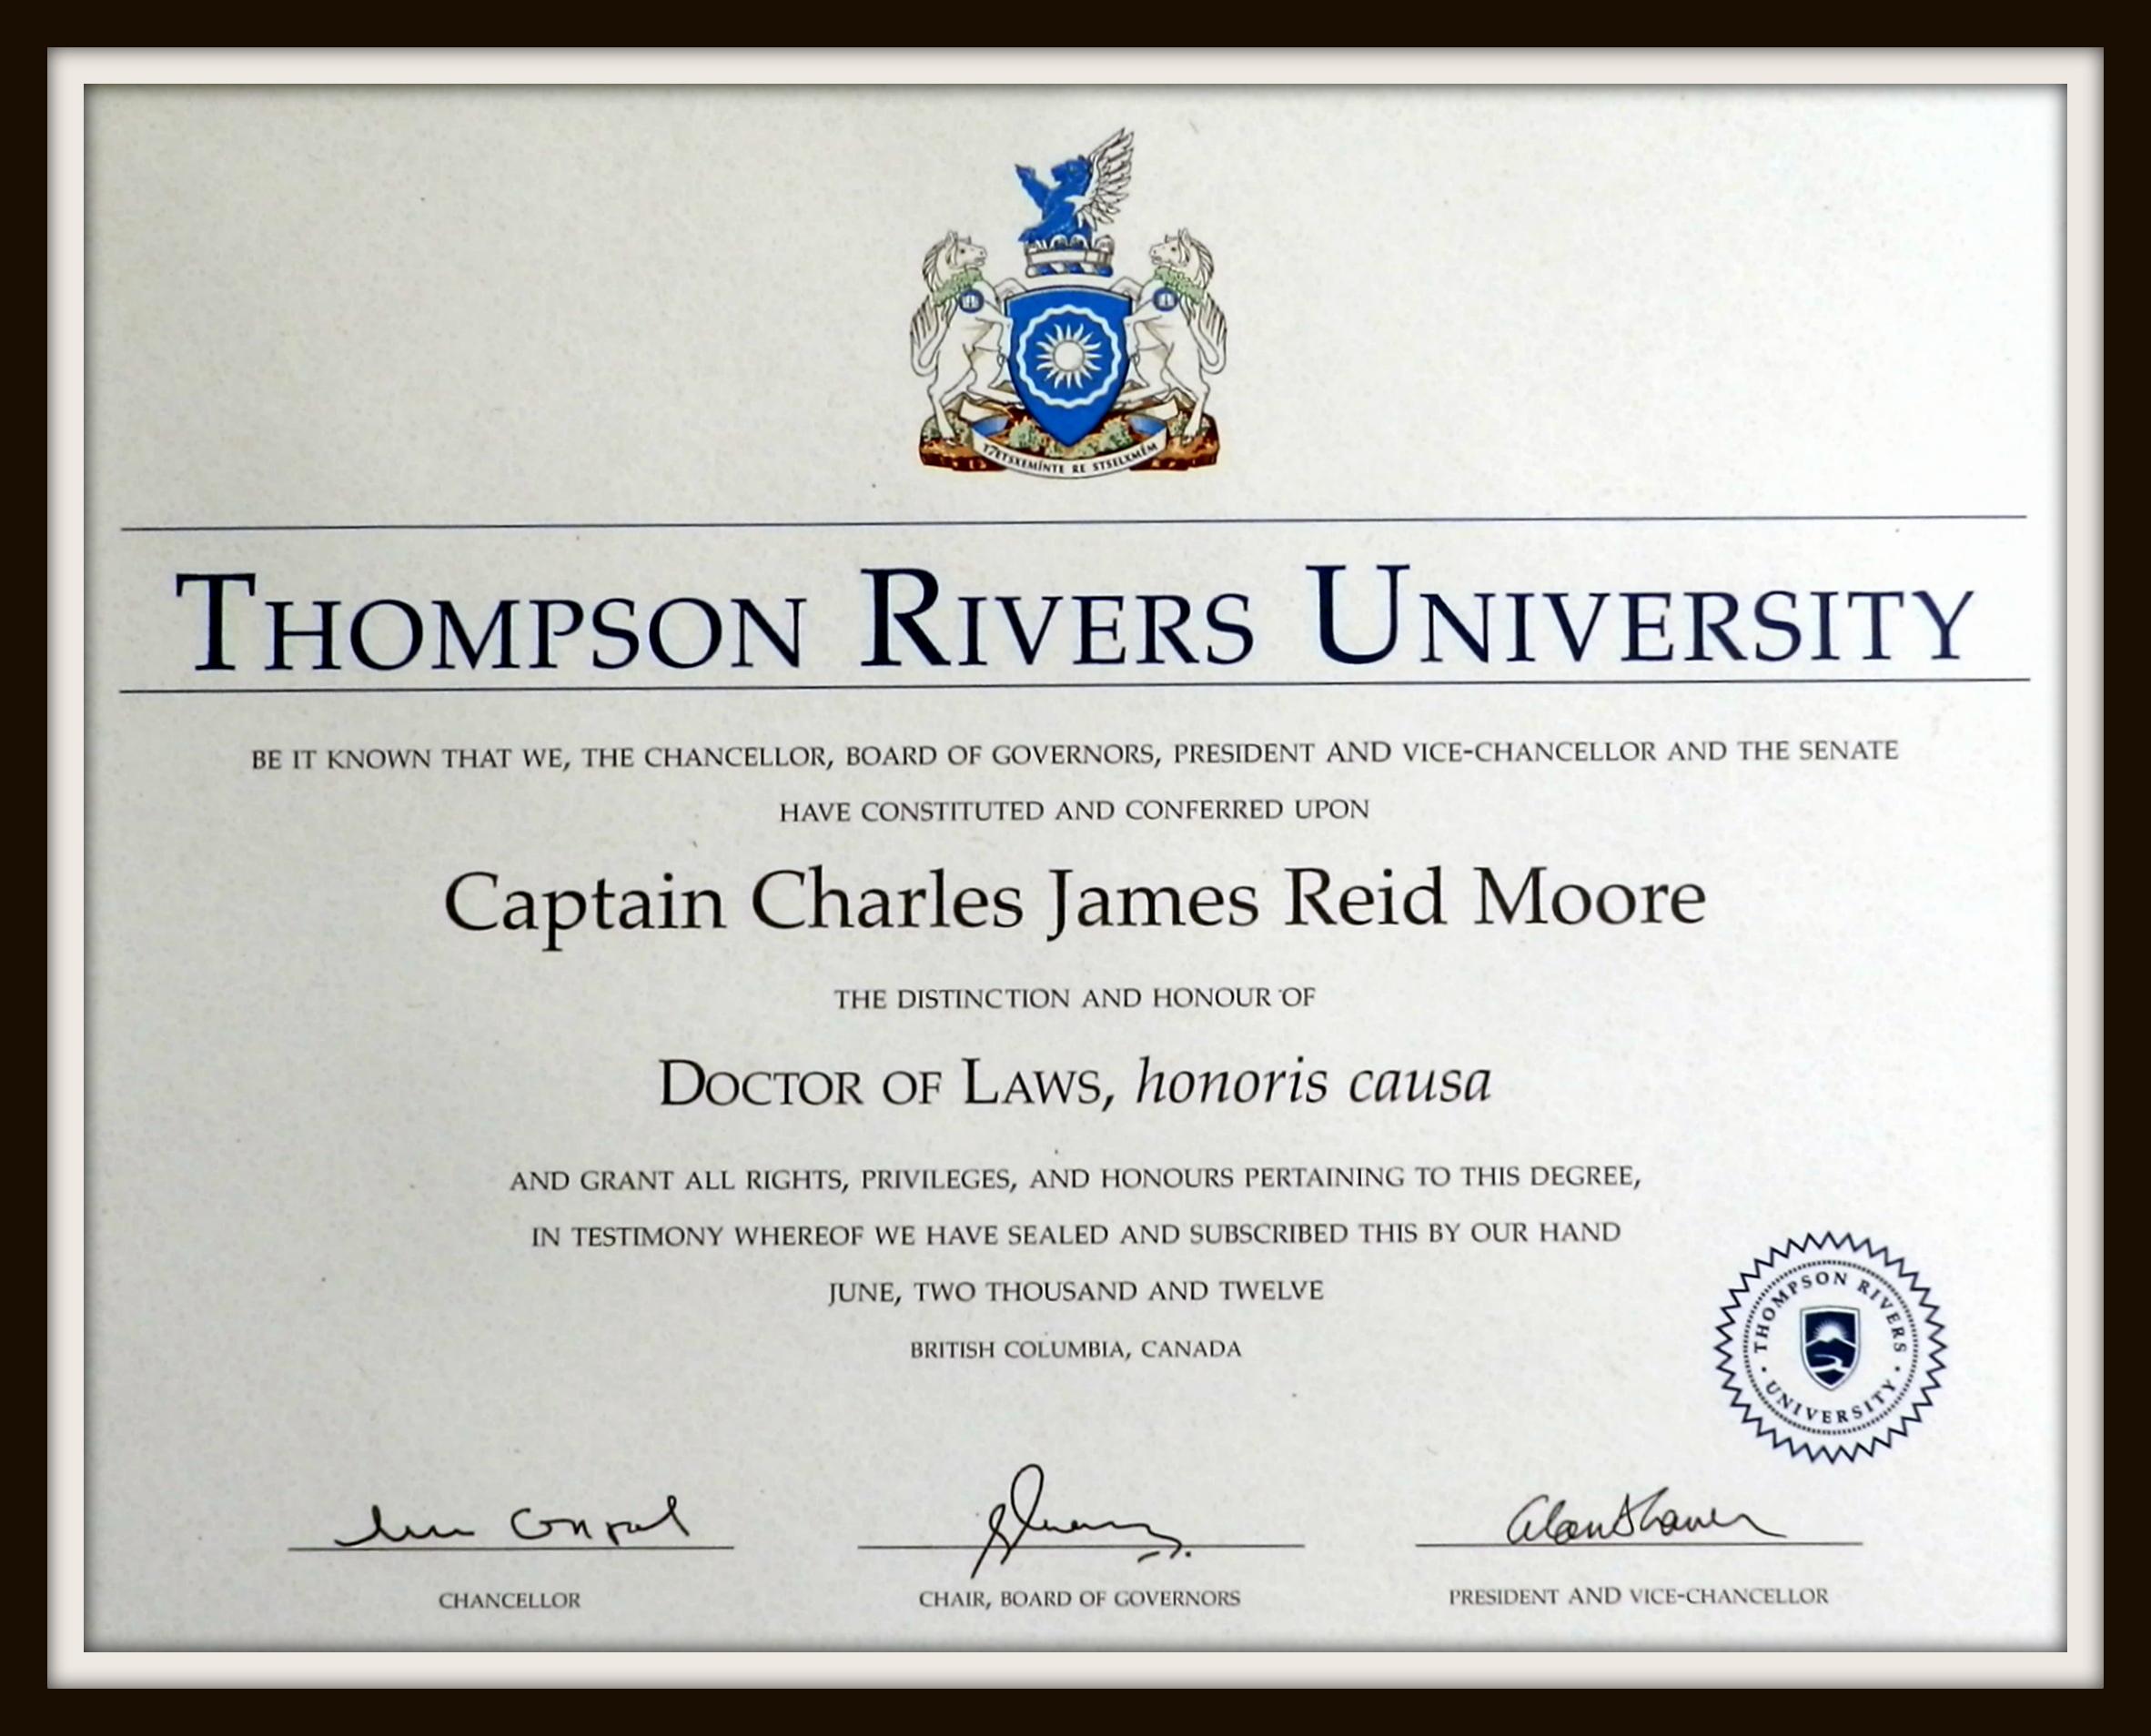 2012 Honorary Doctorate